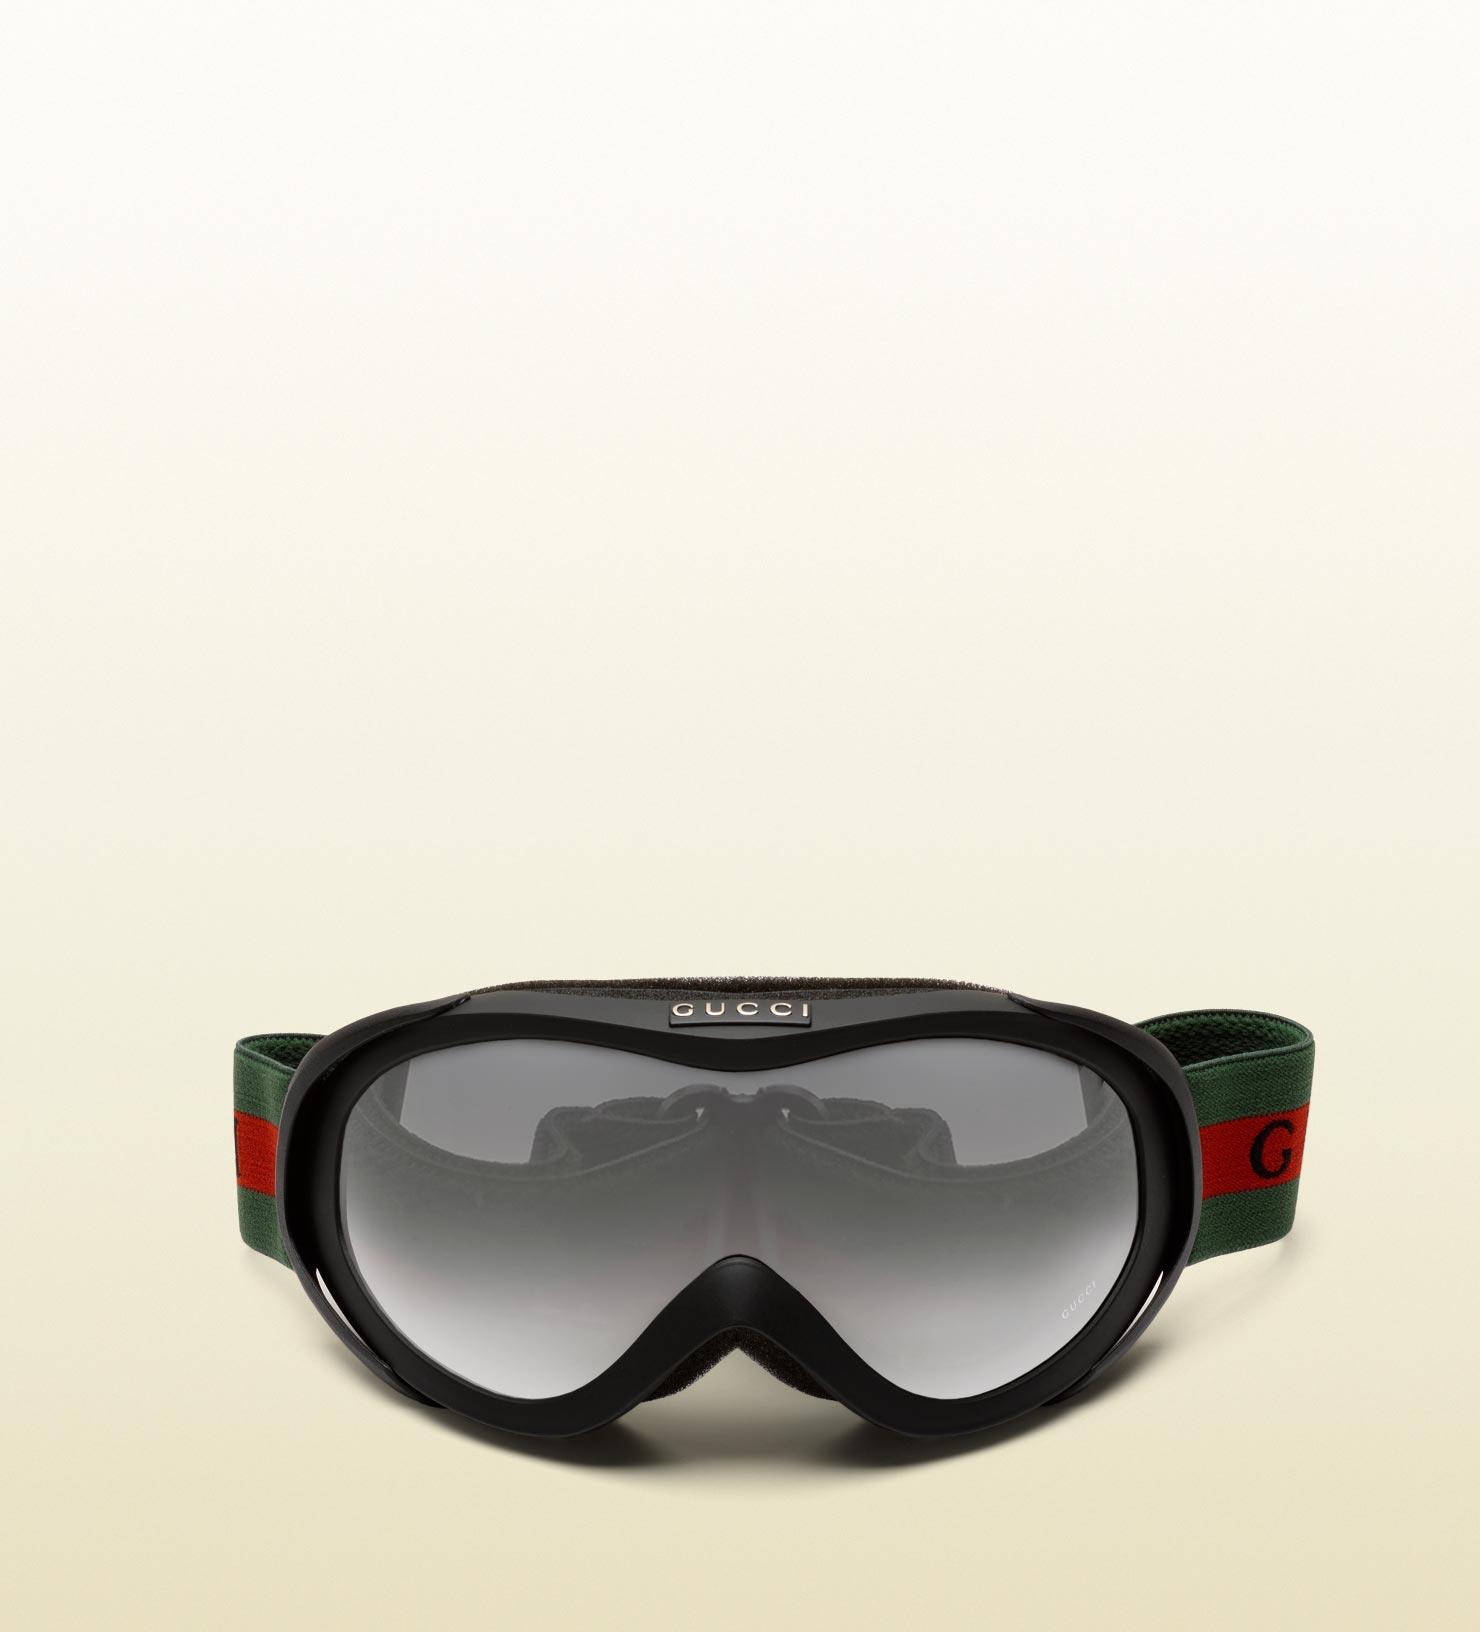 black ski goggles y8l8  Gallery